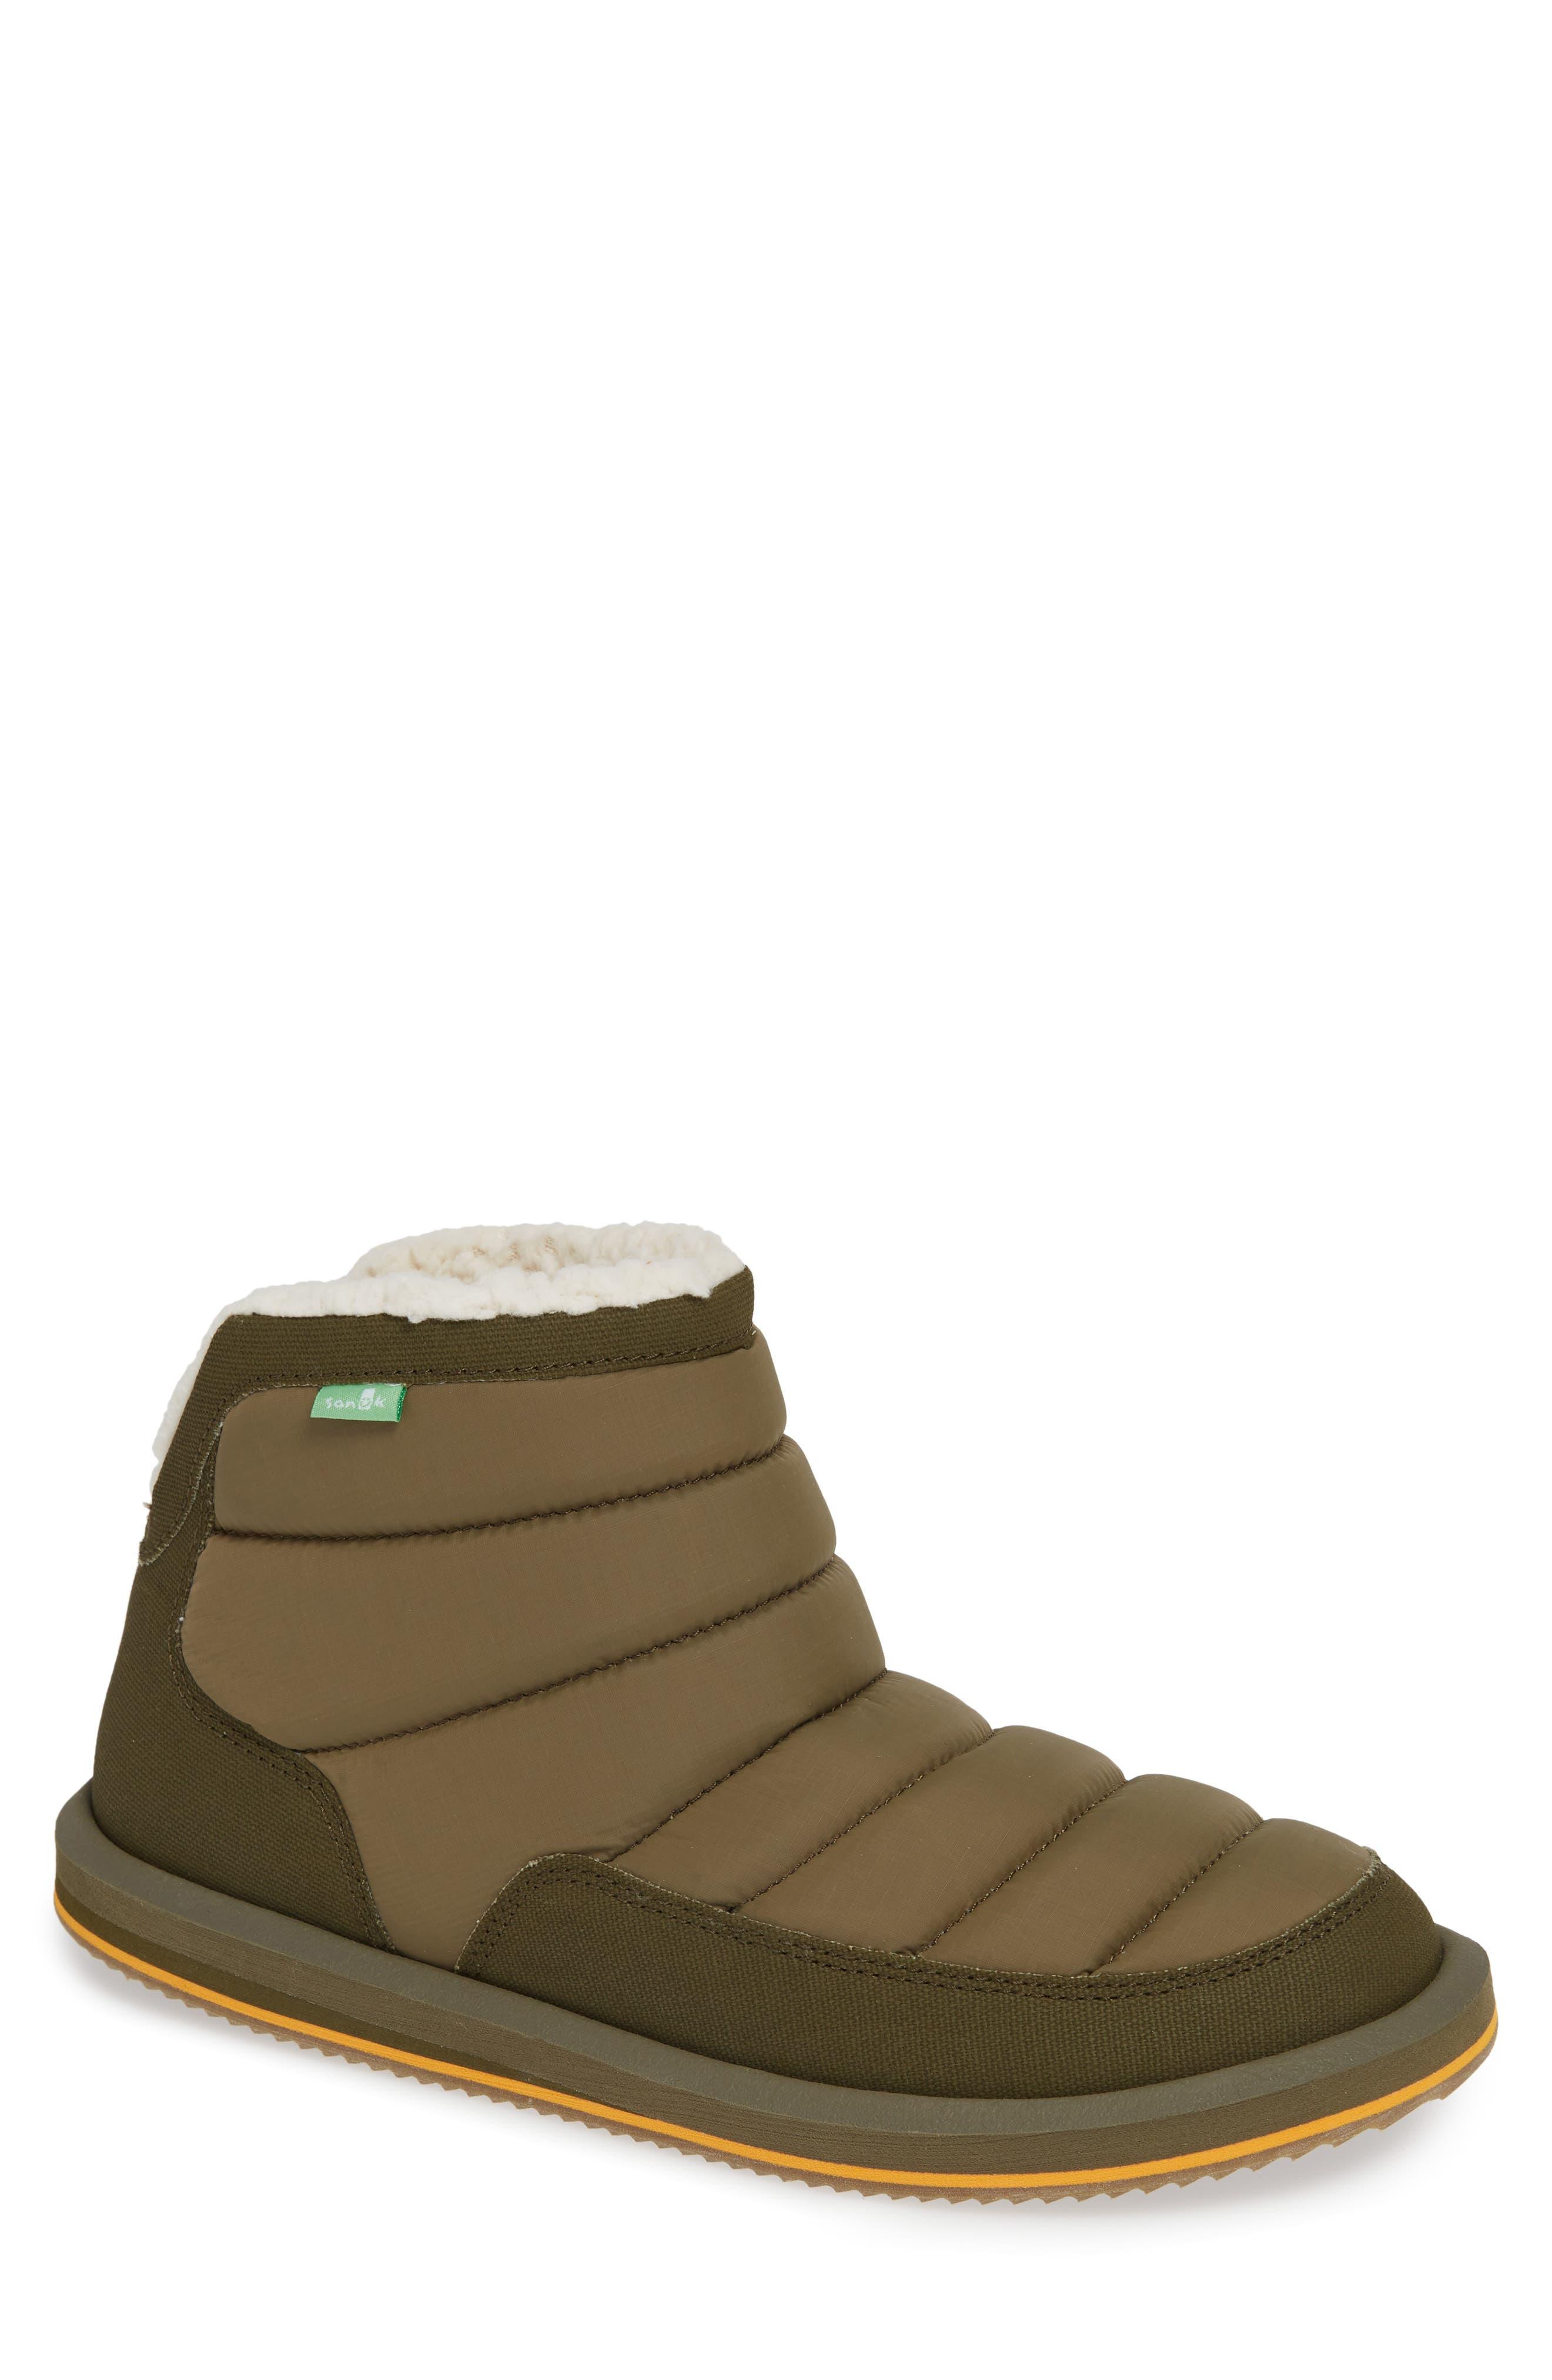 Sanuk Puff & Chill Weather Boot, Green